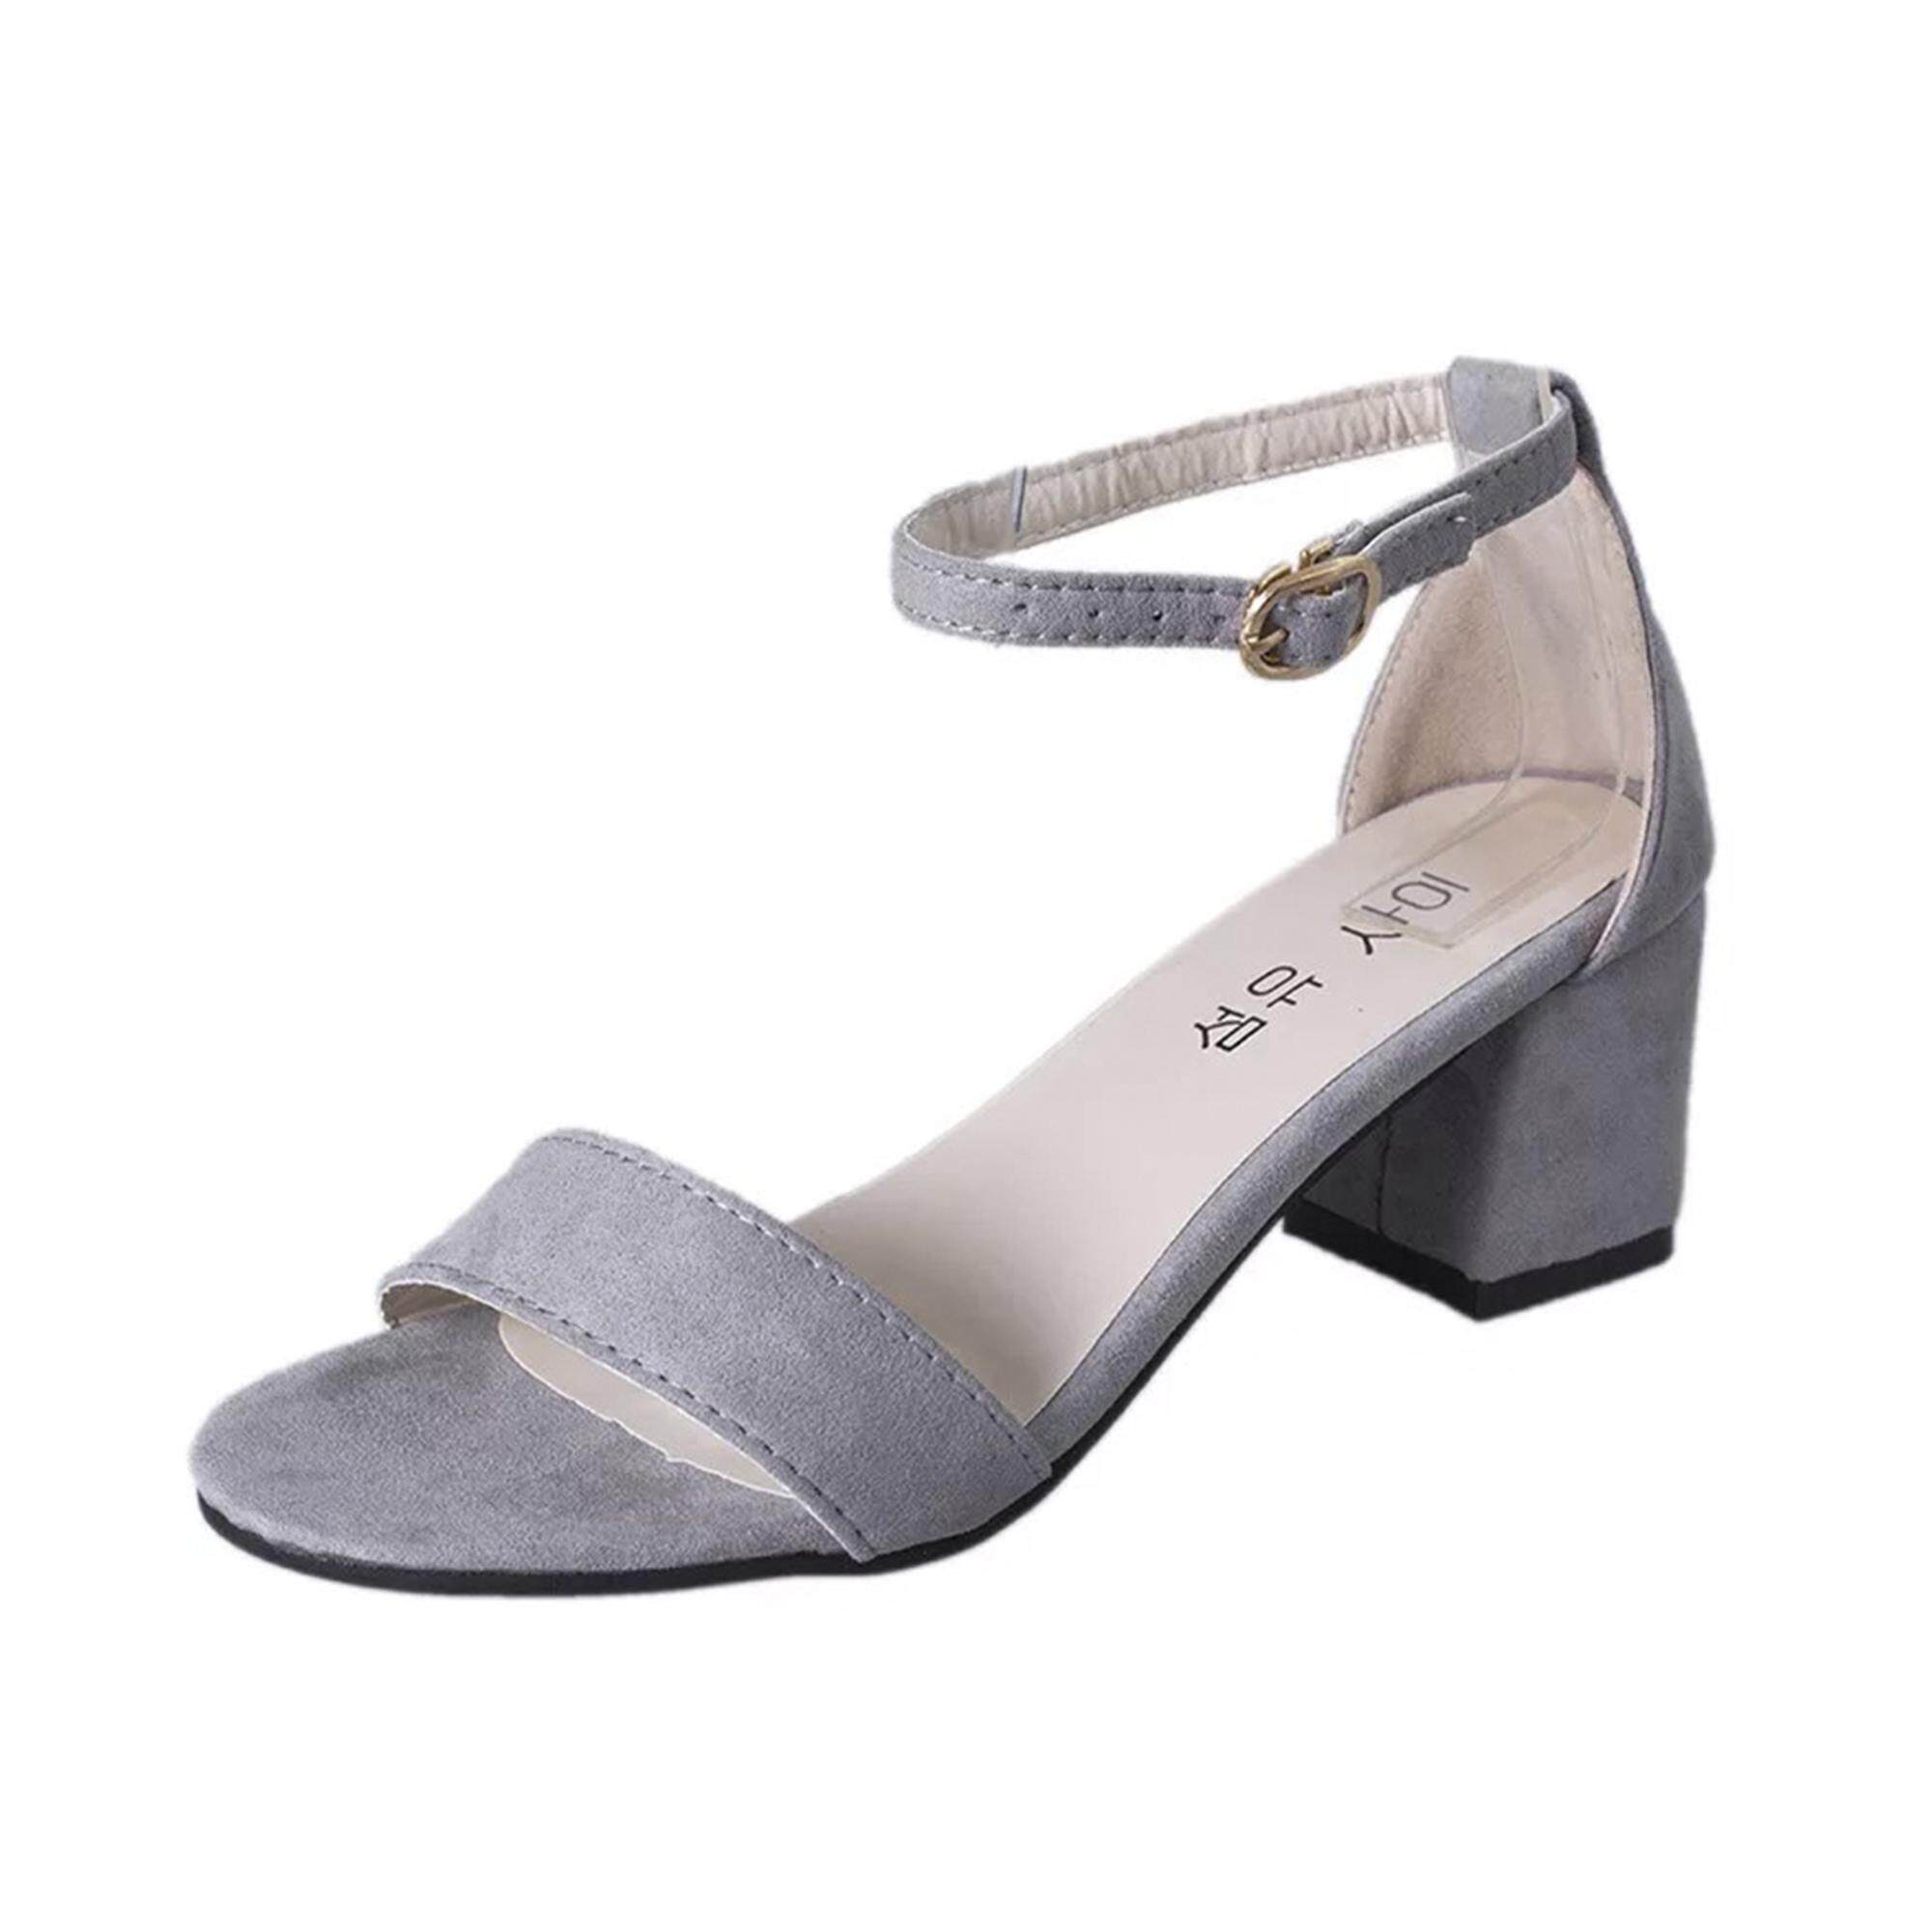 Ladies Shoes For The Best Price In Malaysia Baby Heels Sepatu Anak Red Rose Plain Heus Ol Elegant Thick Heel